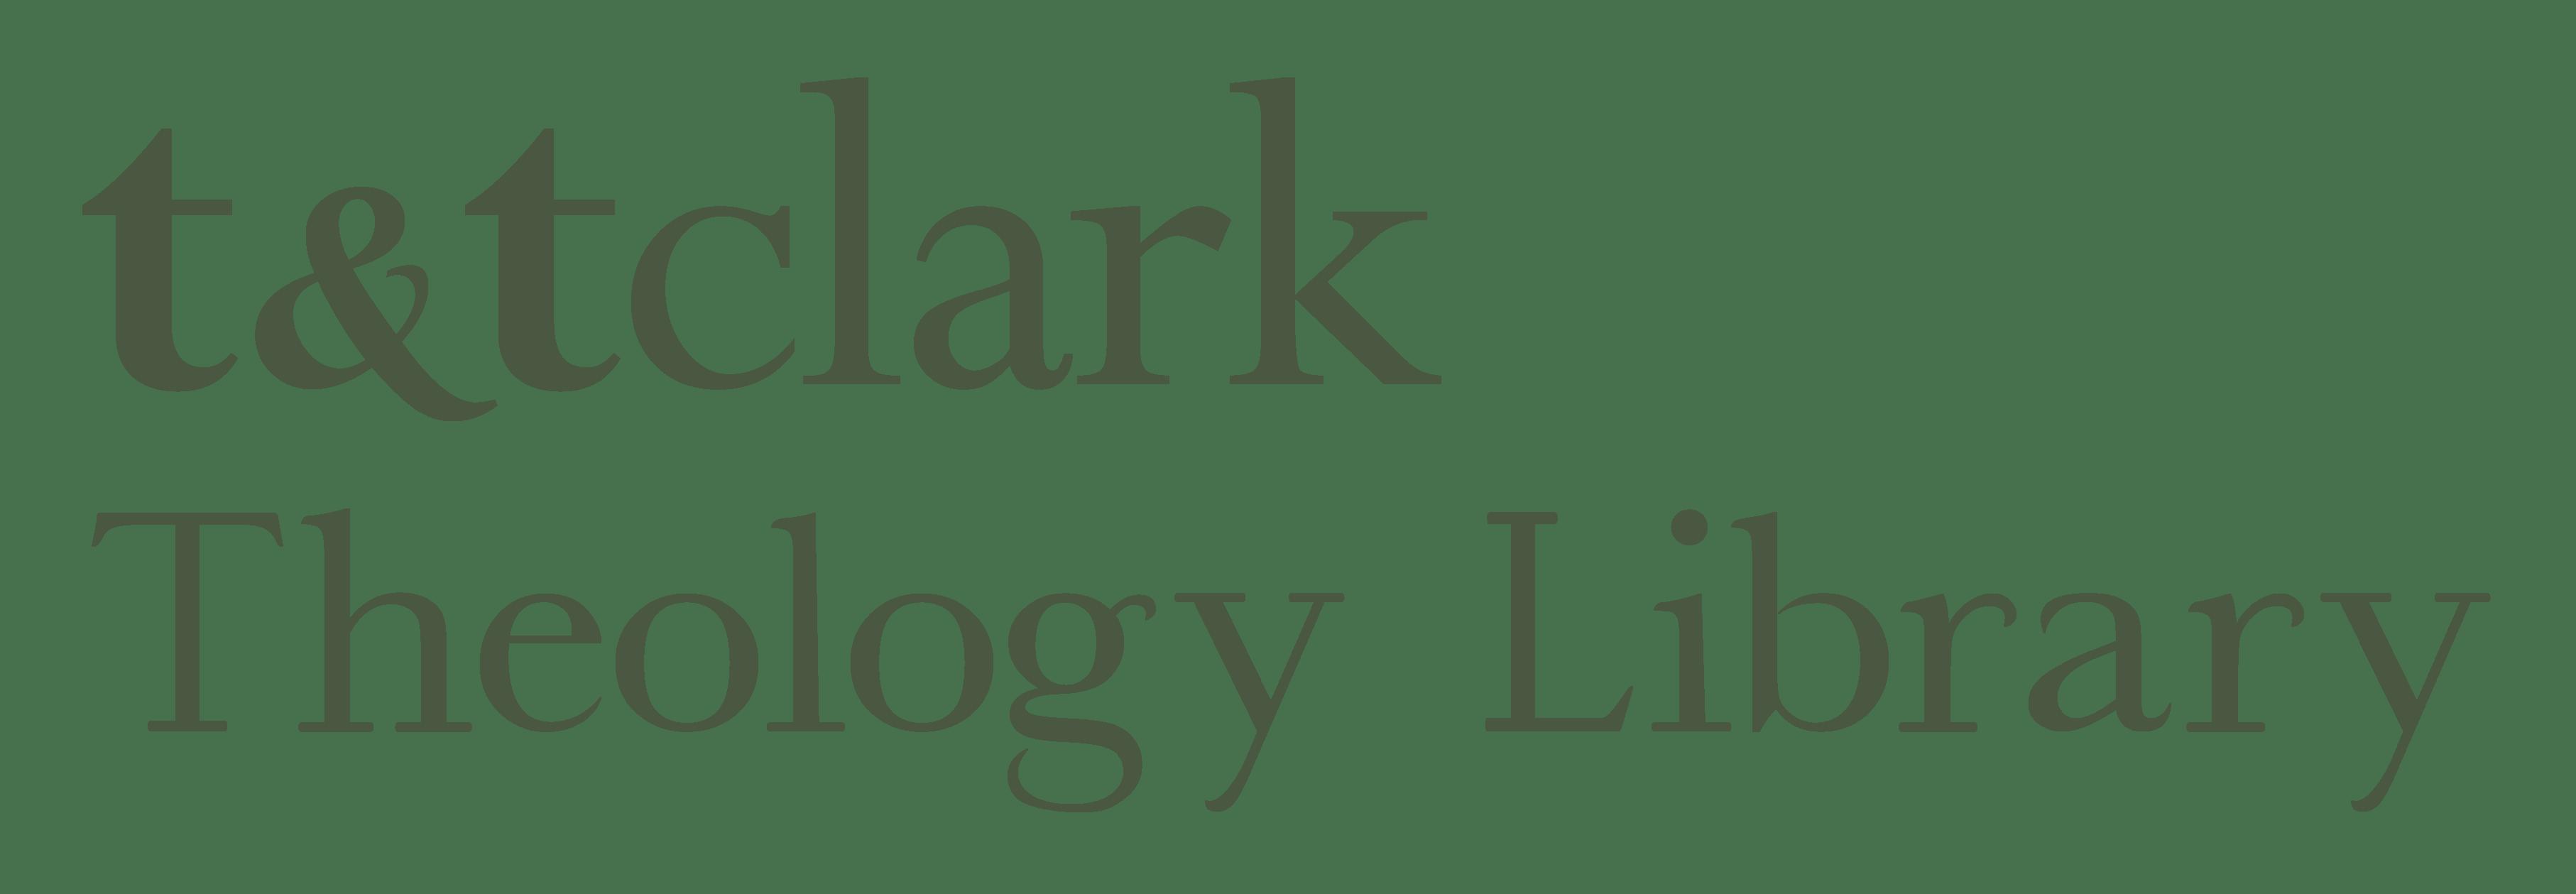 T&T Clark Theology Library logo